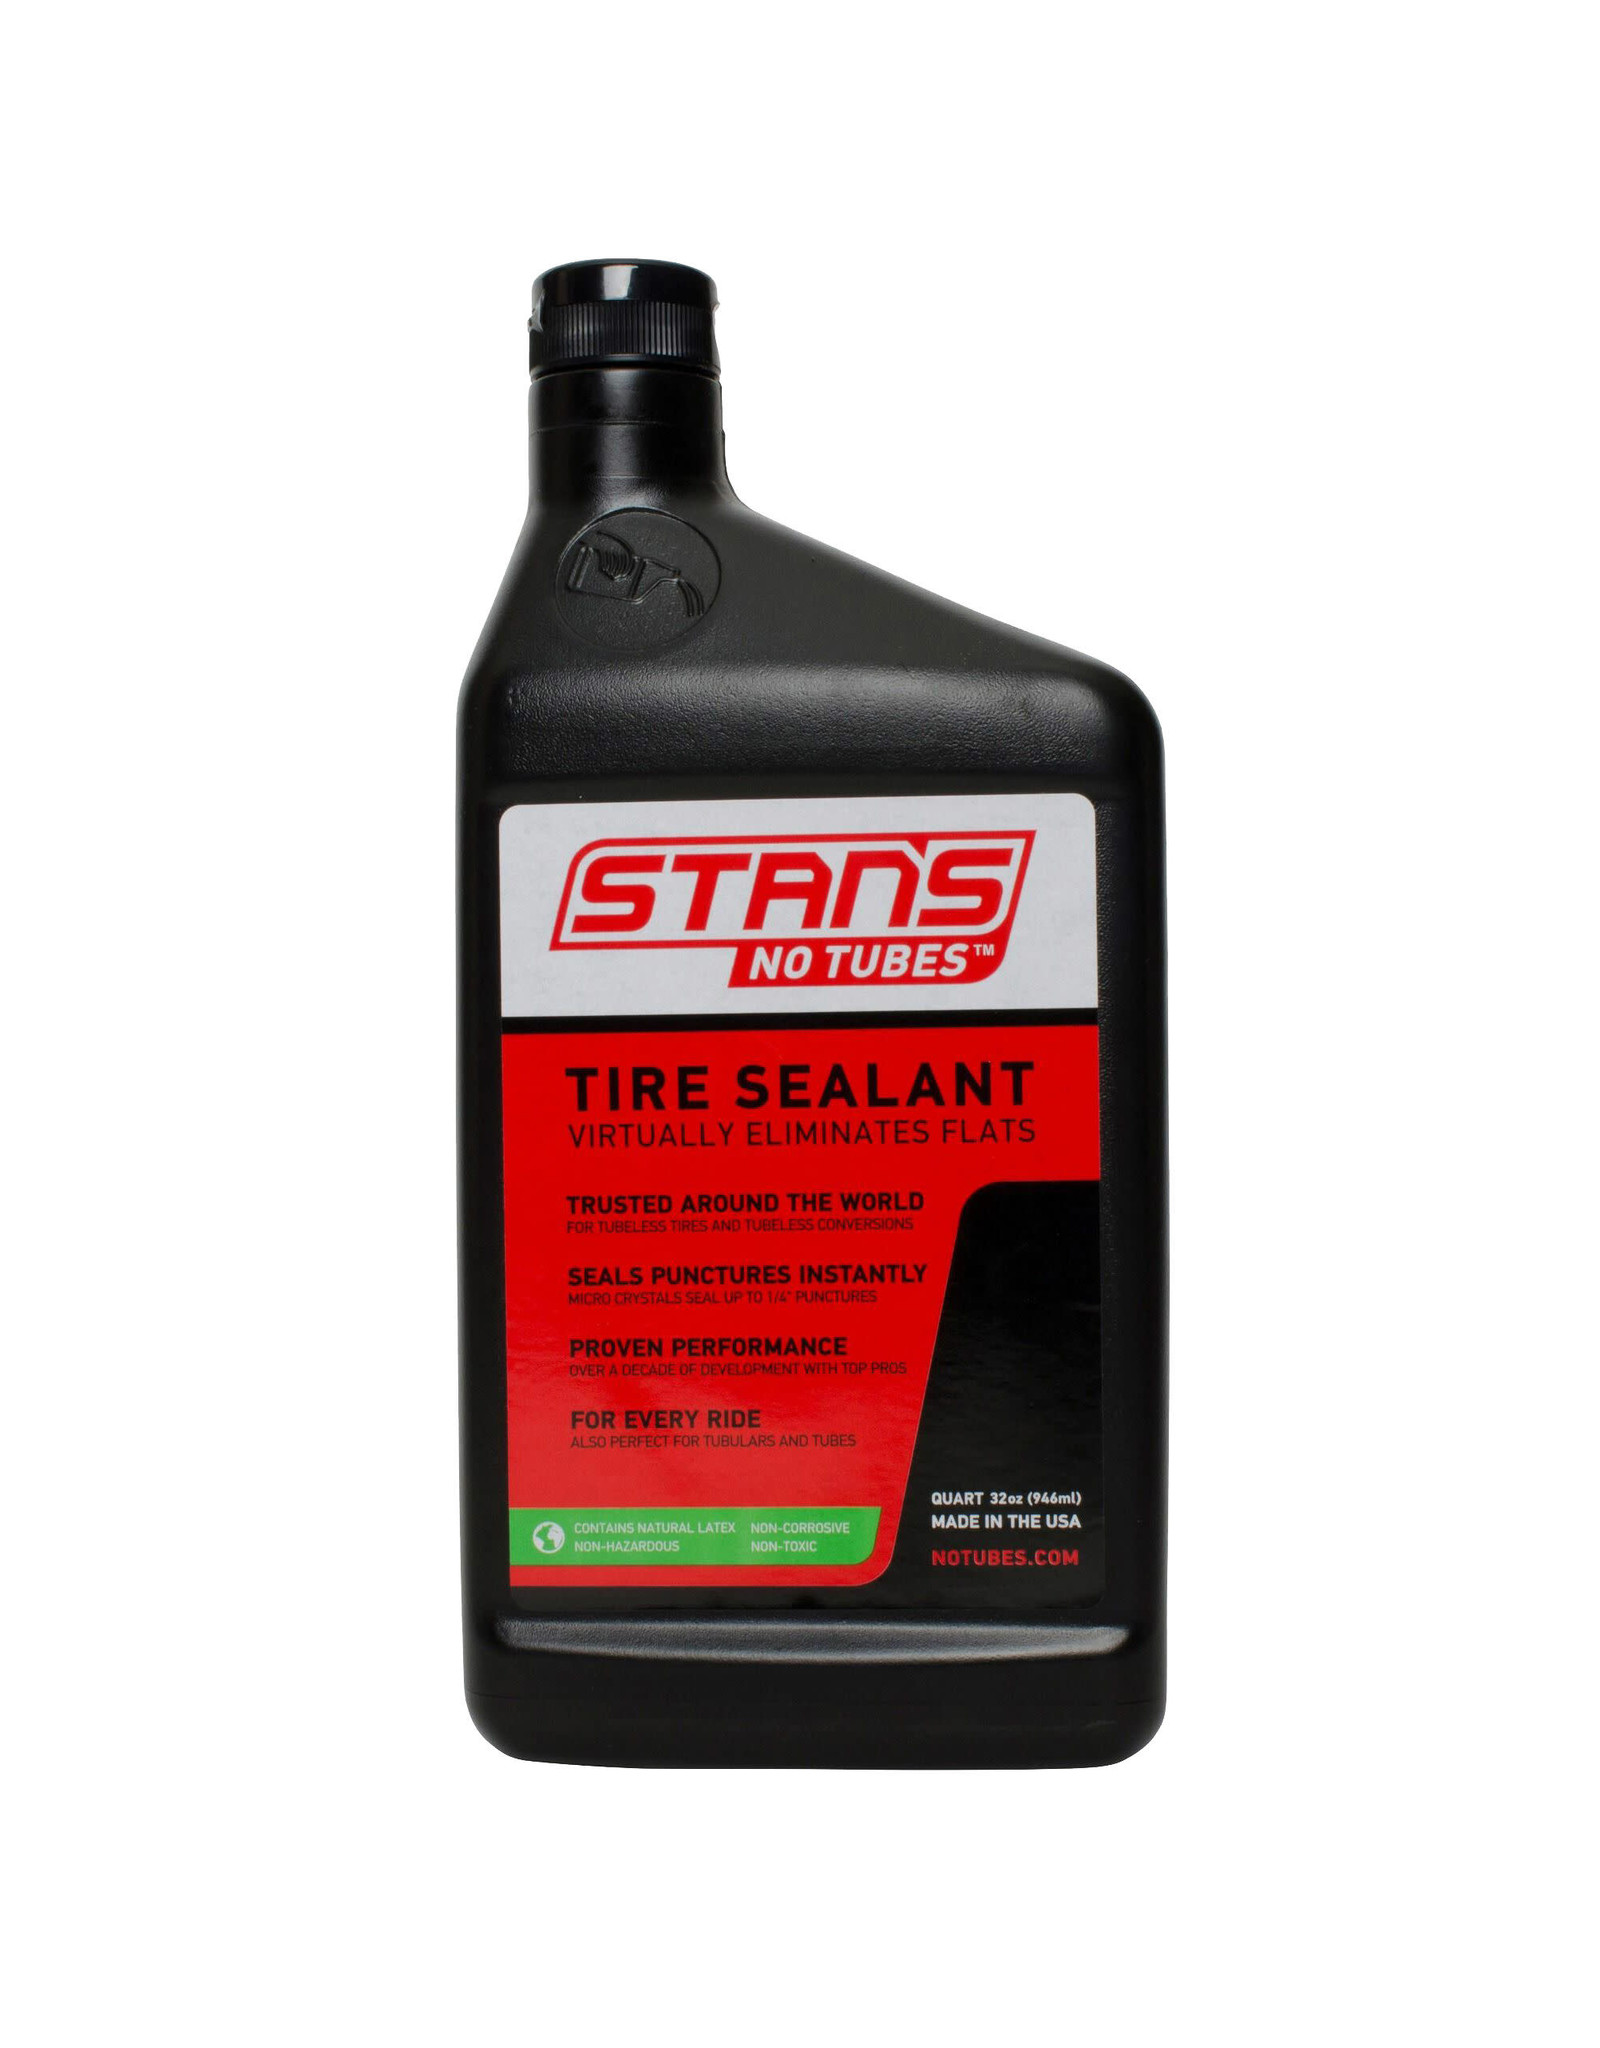 Stan's NoTubes Tire Sealant 32oz (946ml)